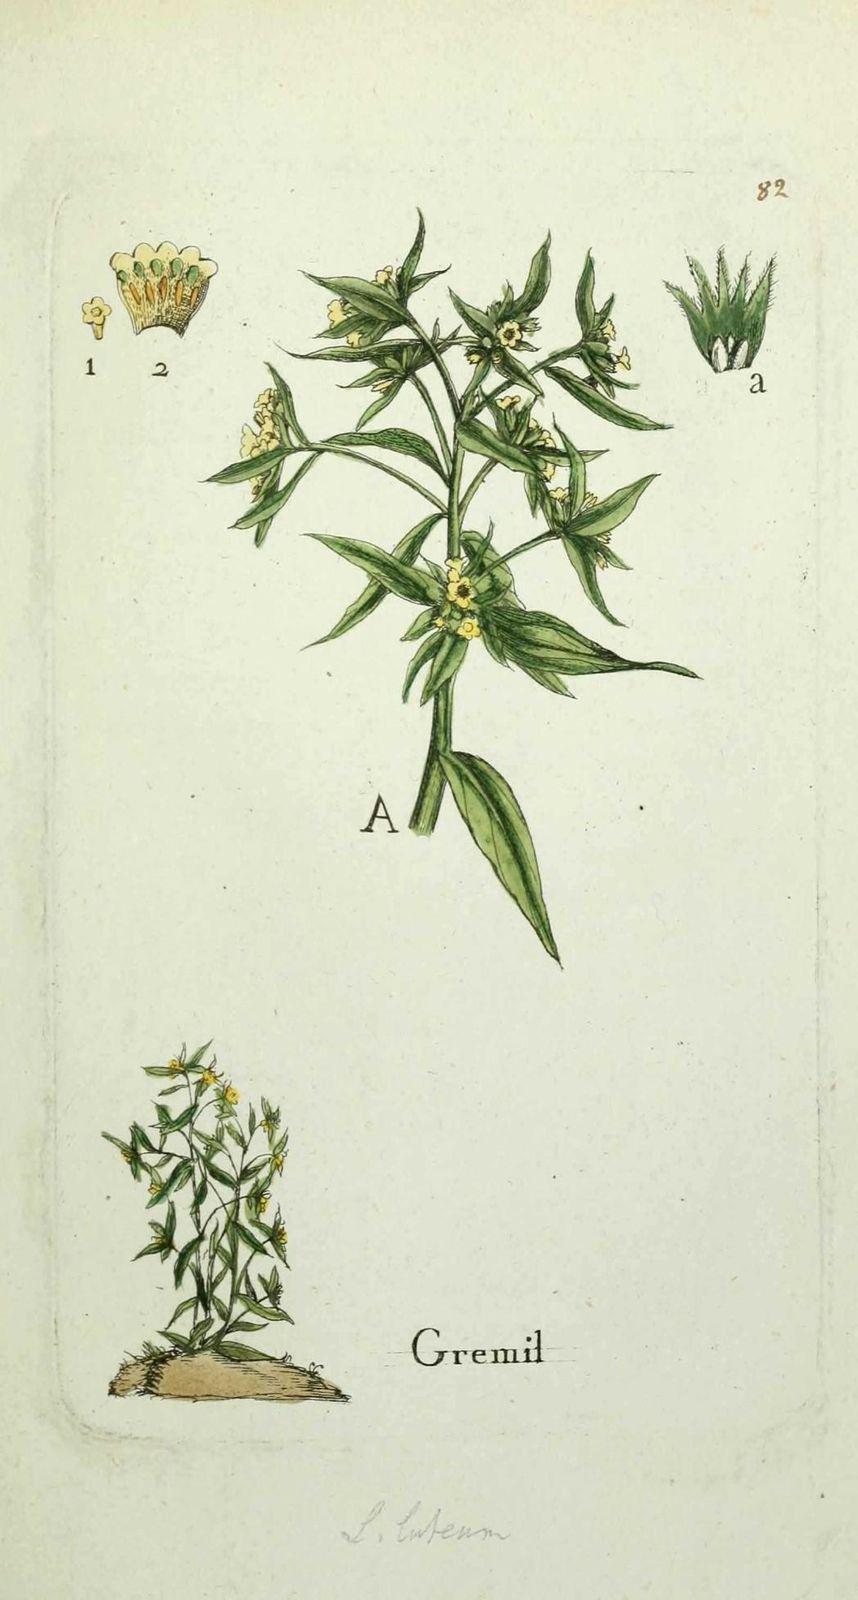 gremil - lithospermum officinale ( herbe aux perles )